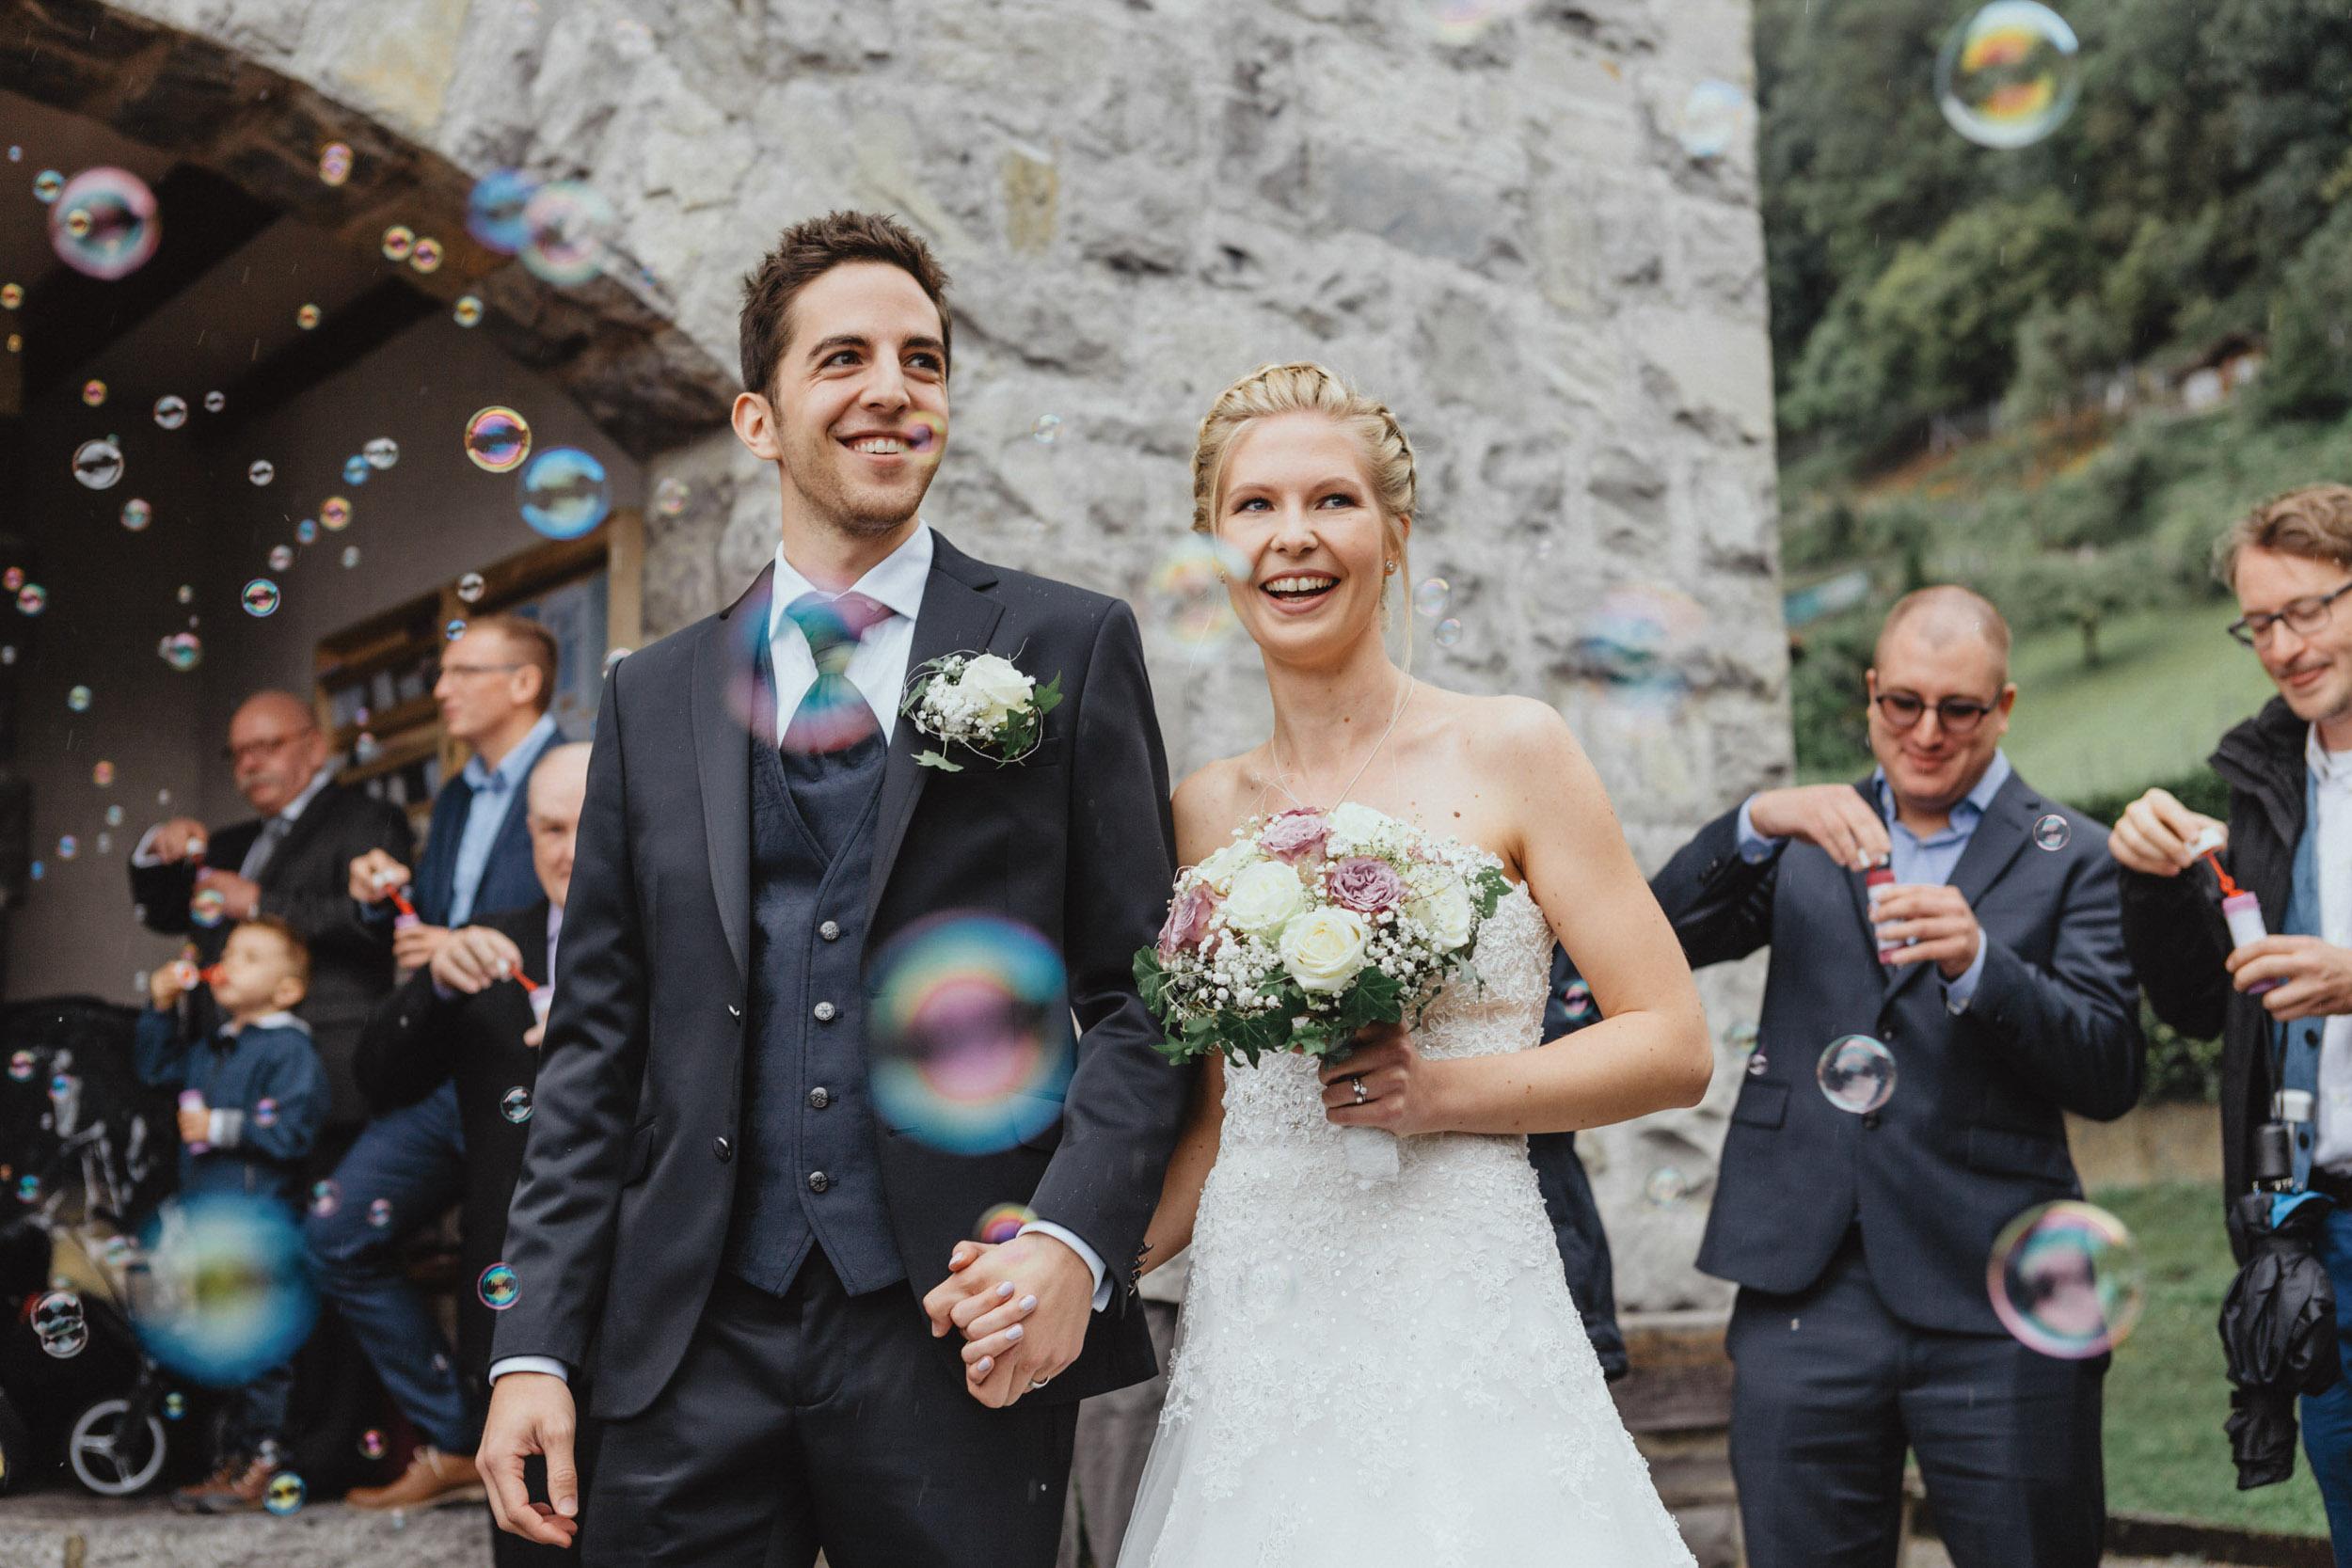 hochzeitsfotografie-schweiz_wedding-photographer-switzerland-europe_Bendik-Photography-011